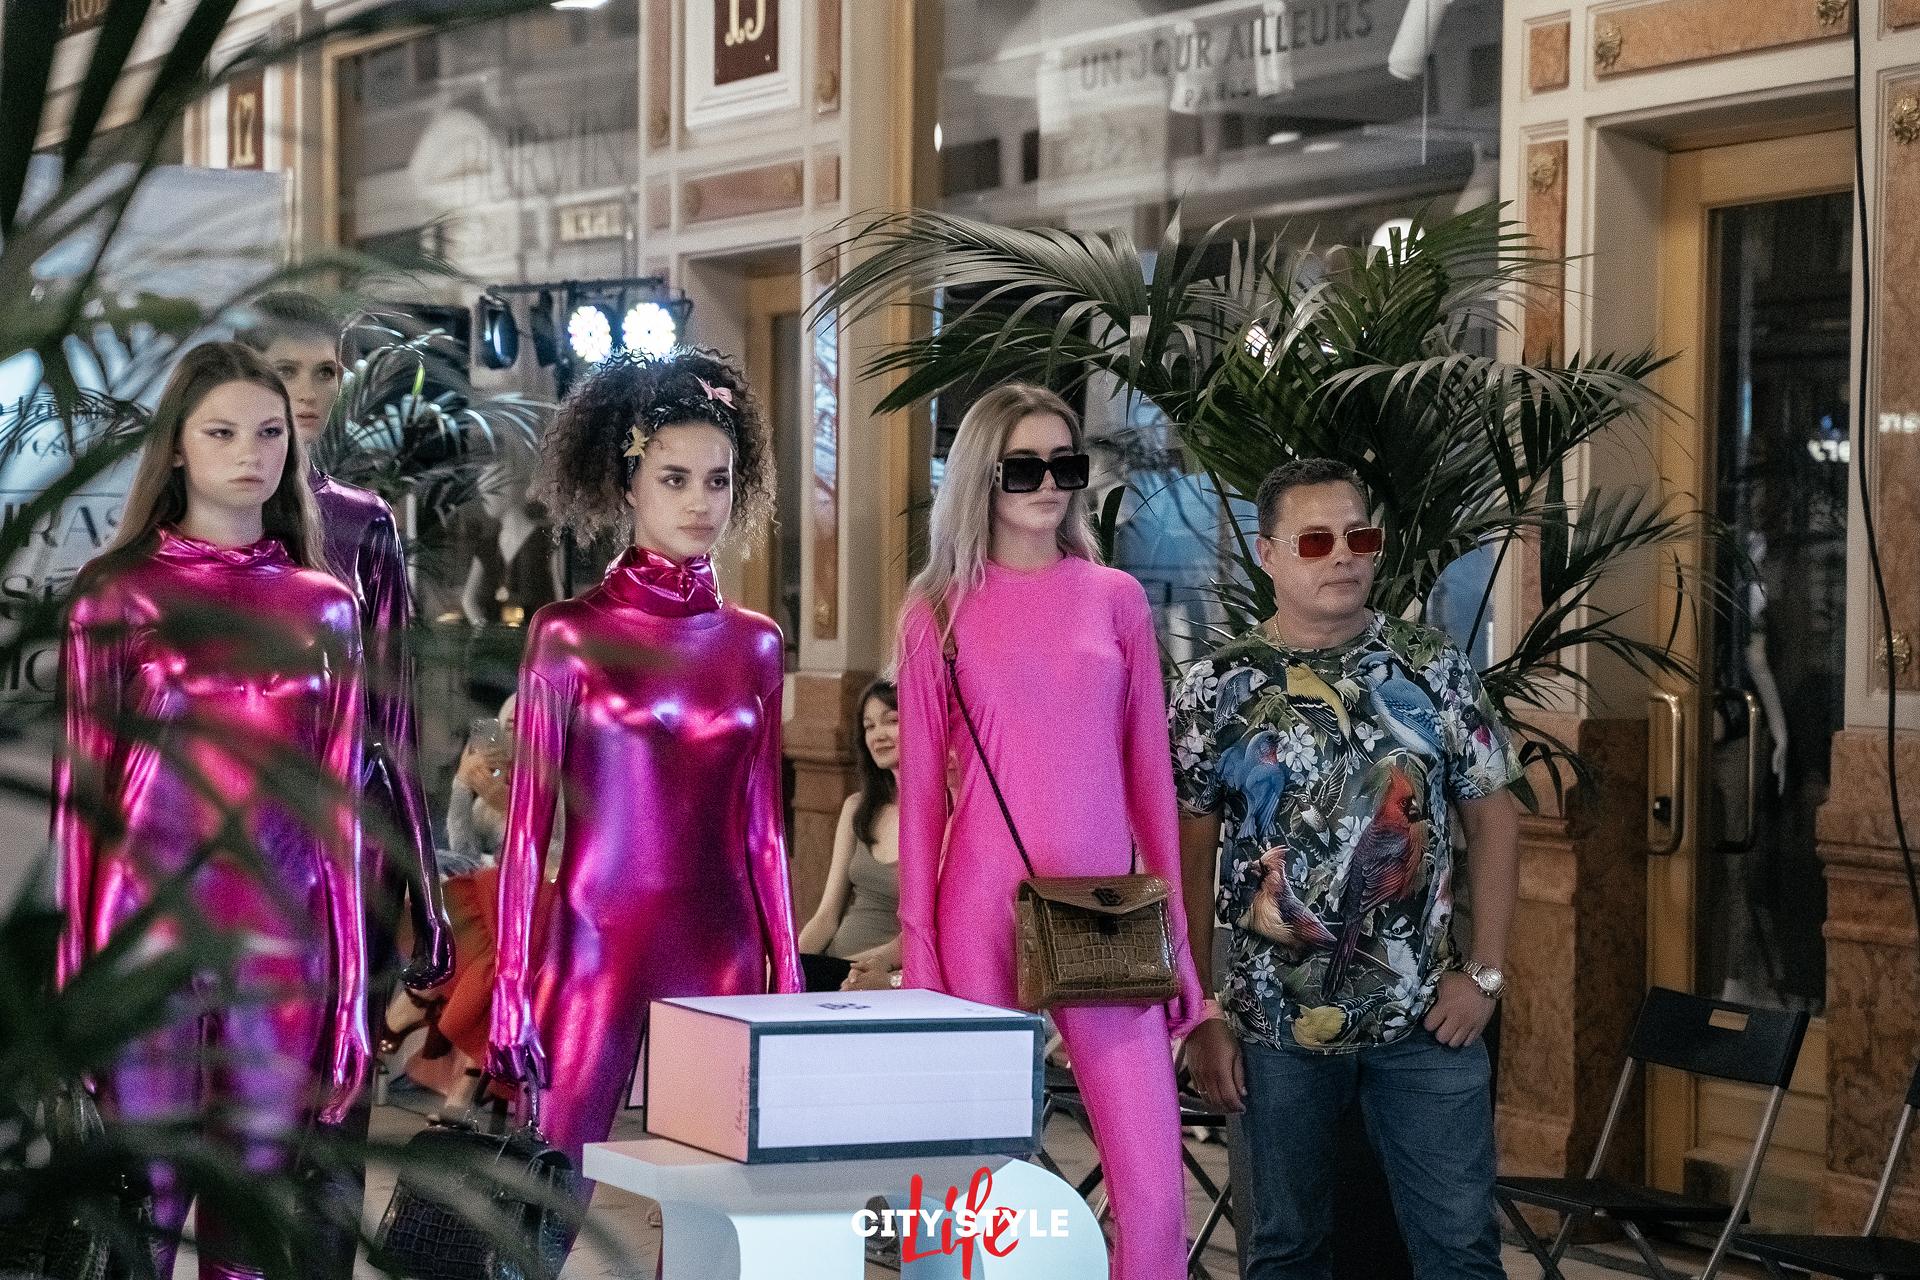 Eurasia Fashion Week concluded with winning smile of Jaf Jafri